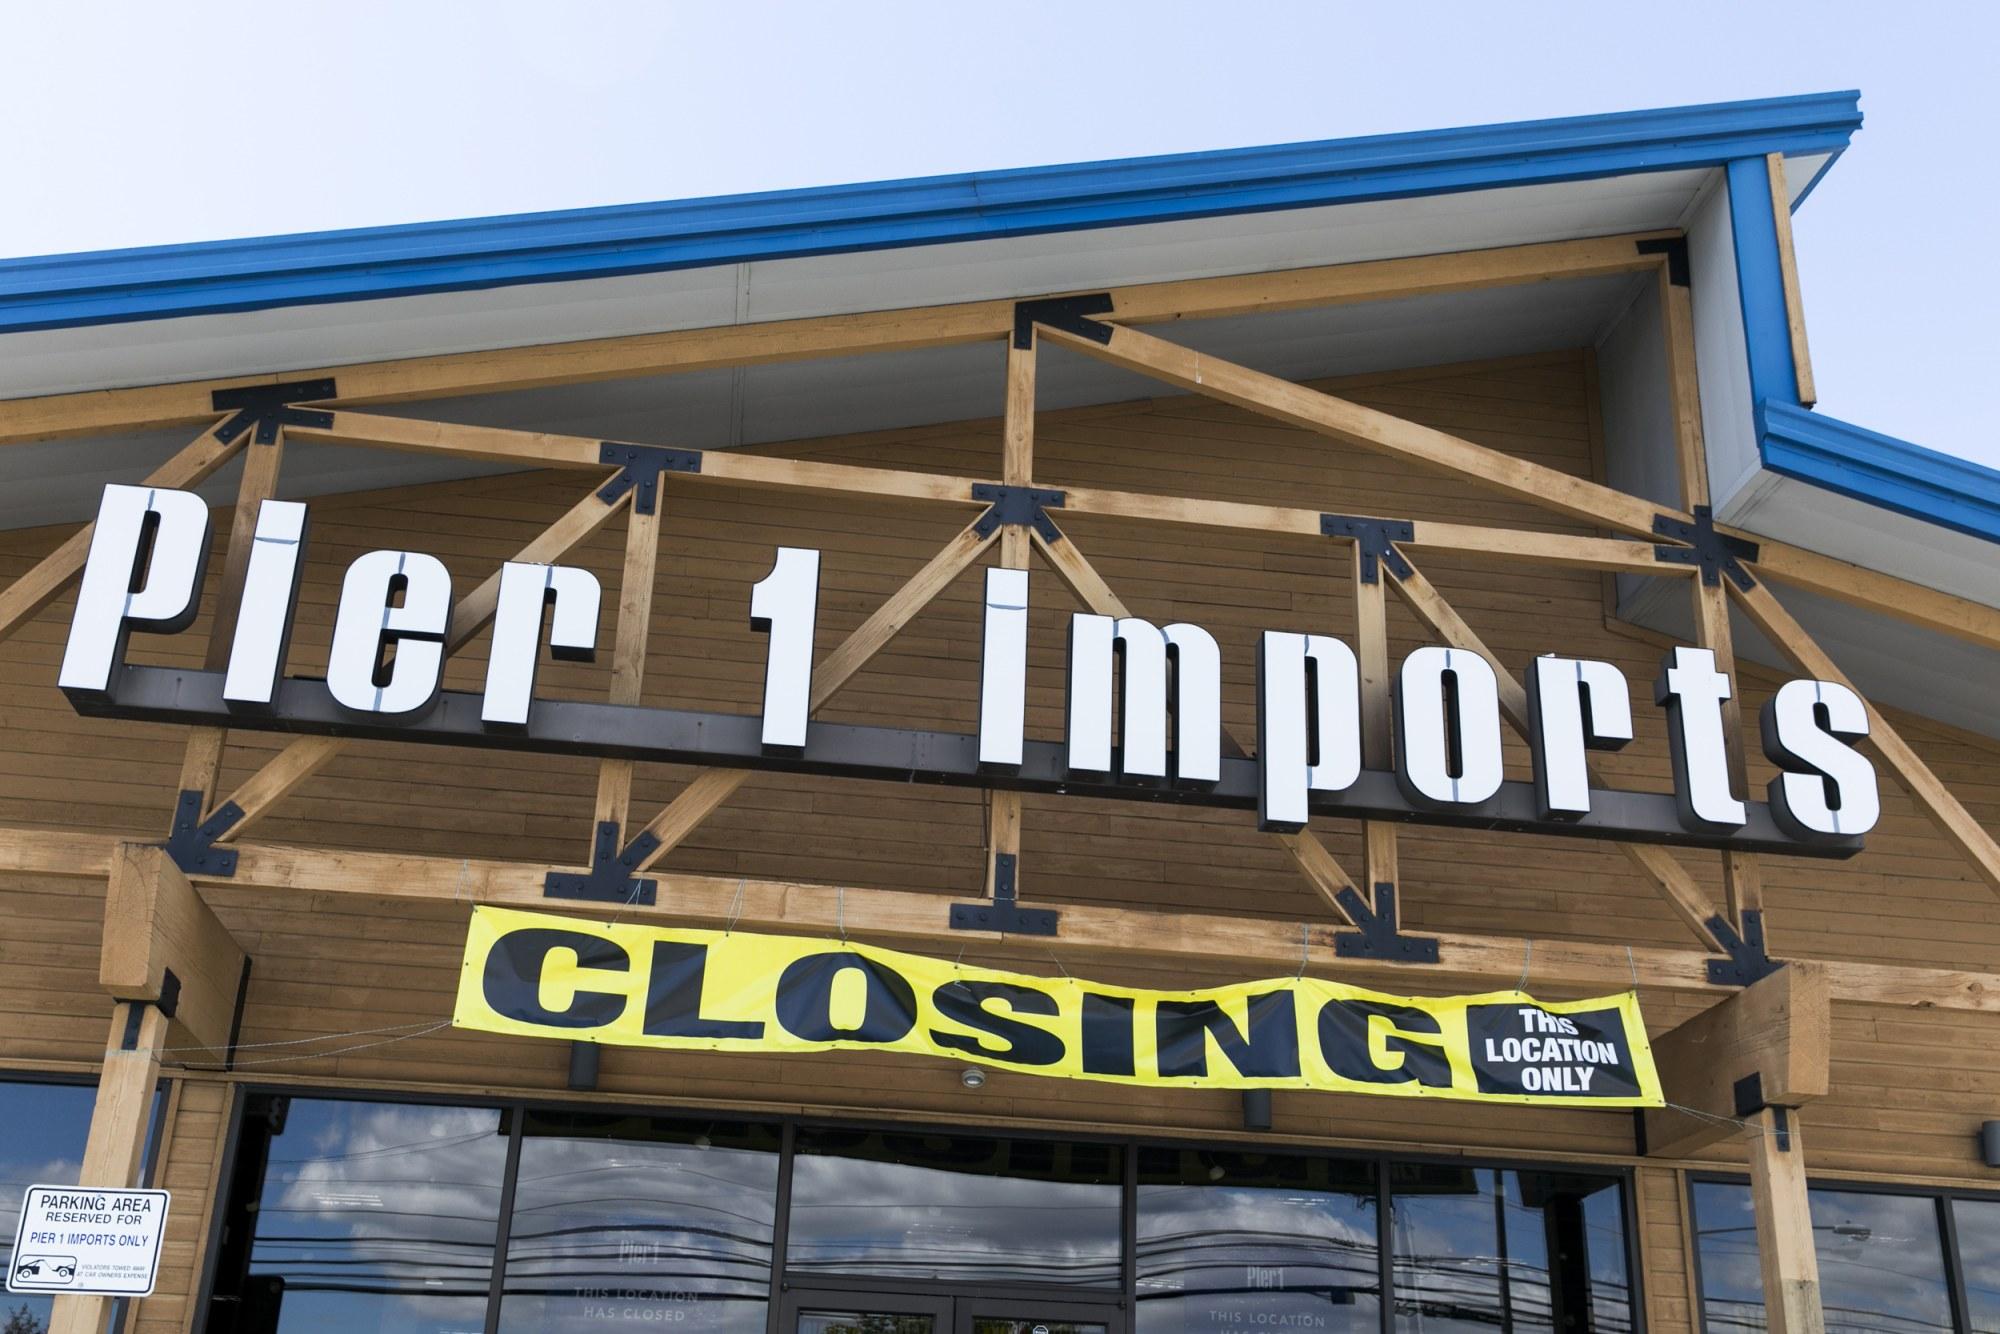 [Image: 200519-pier-1-imports-al-0902_58fe61a214...-2000w.jpg]